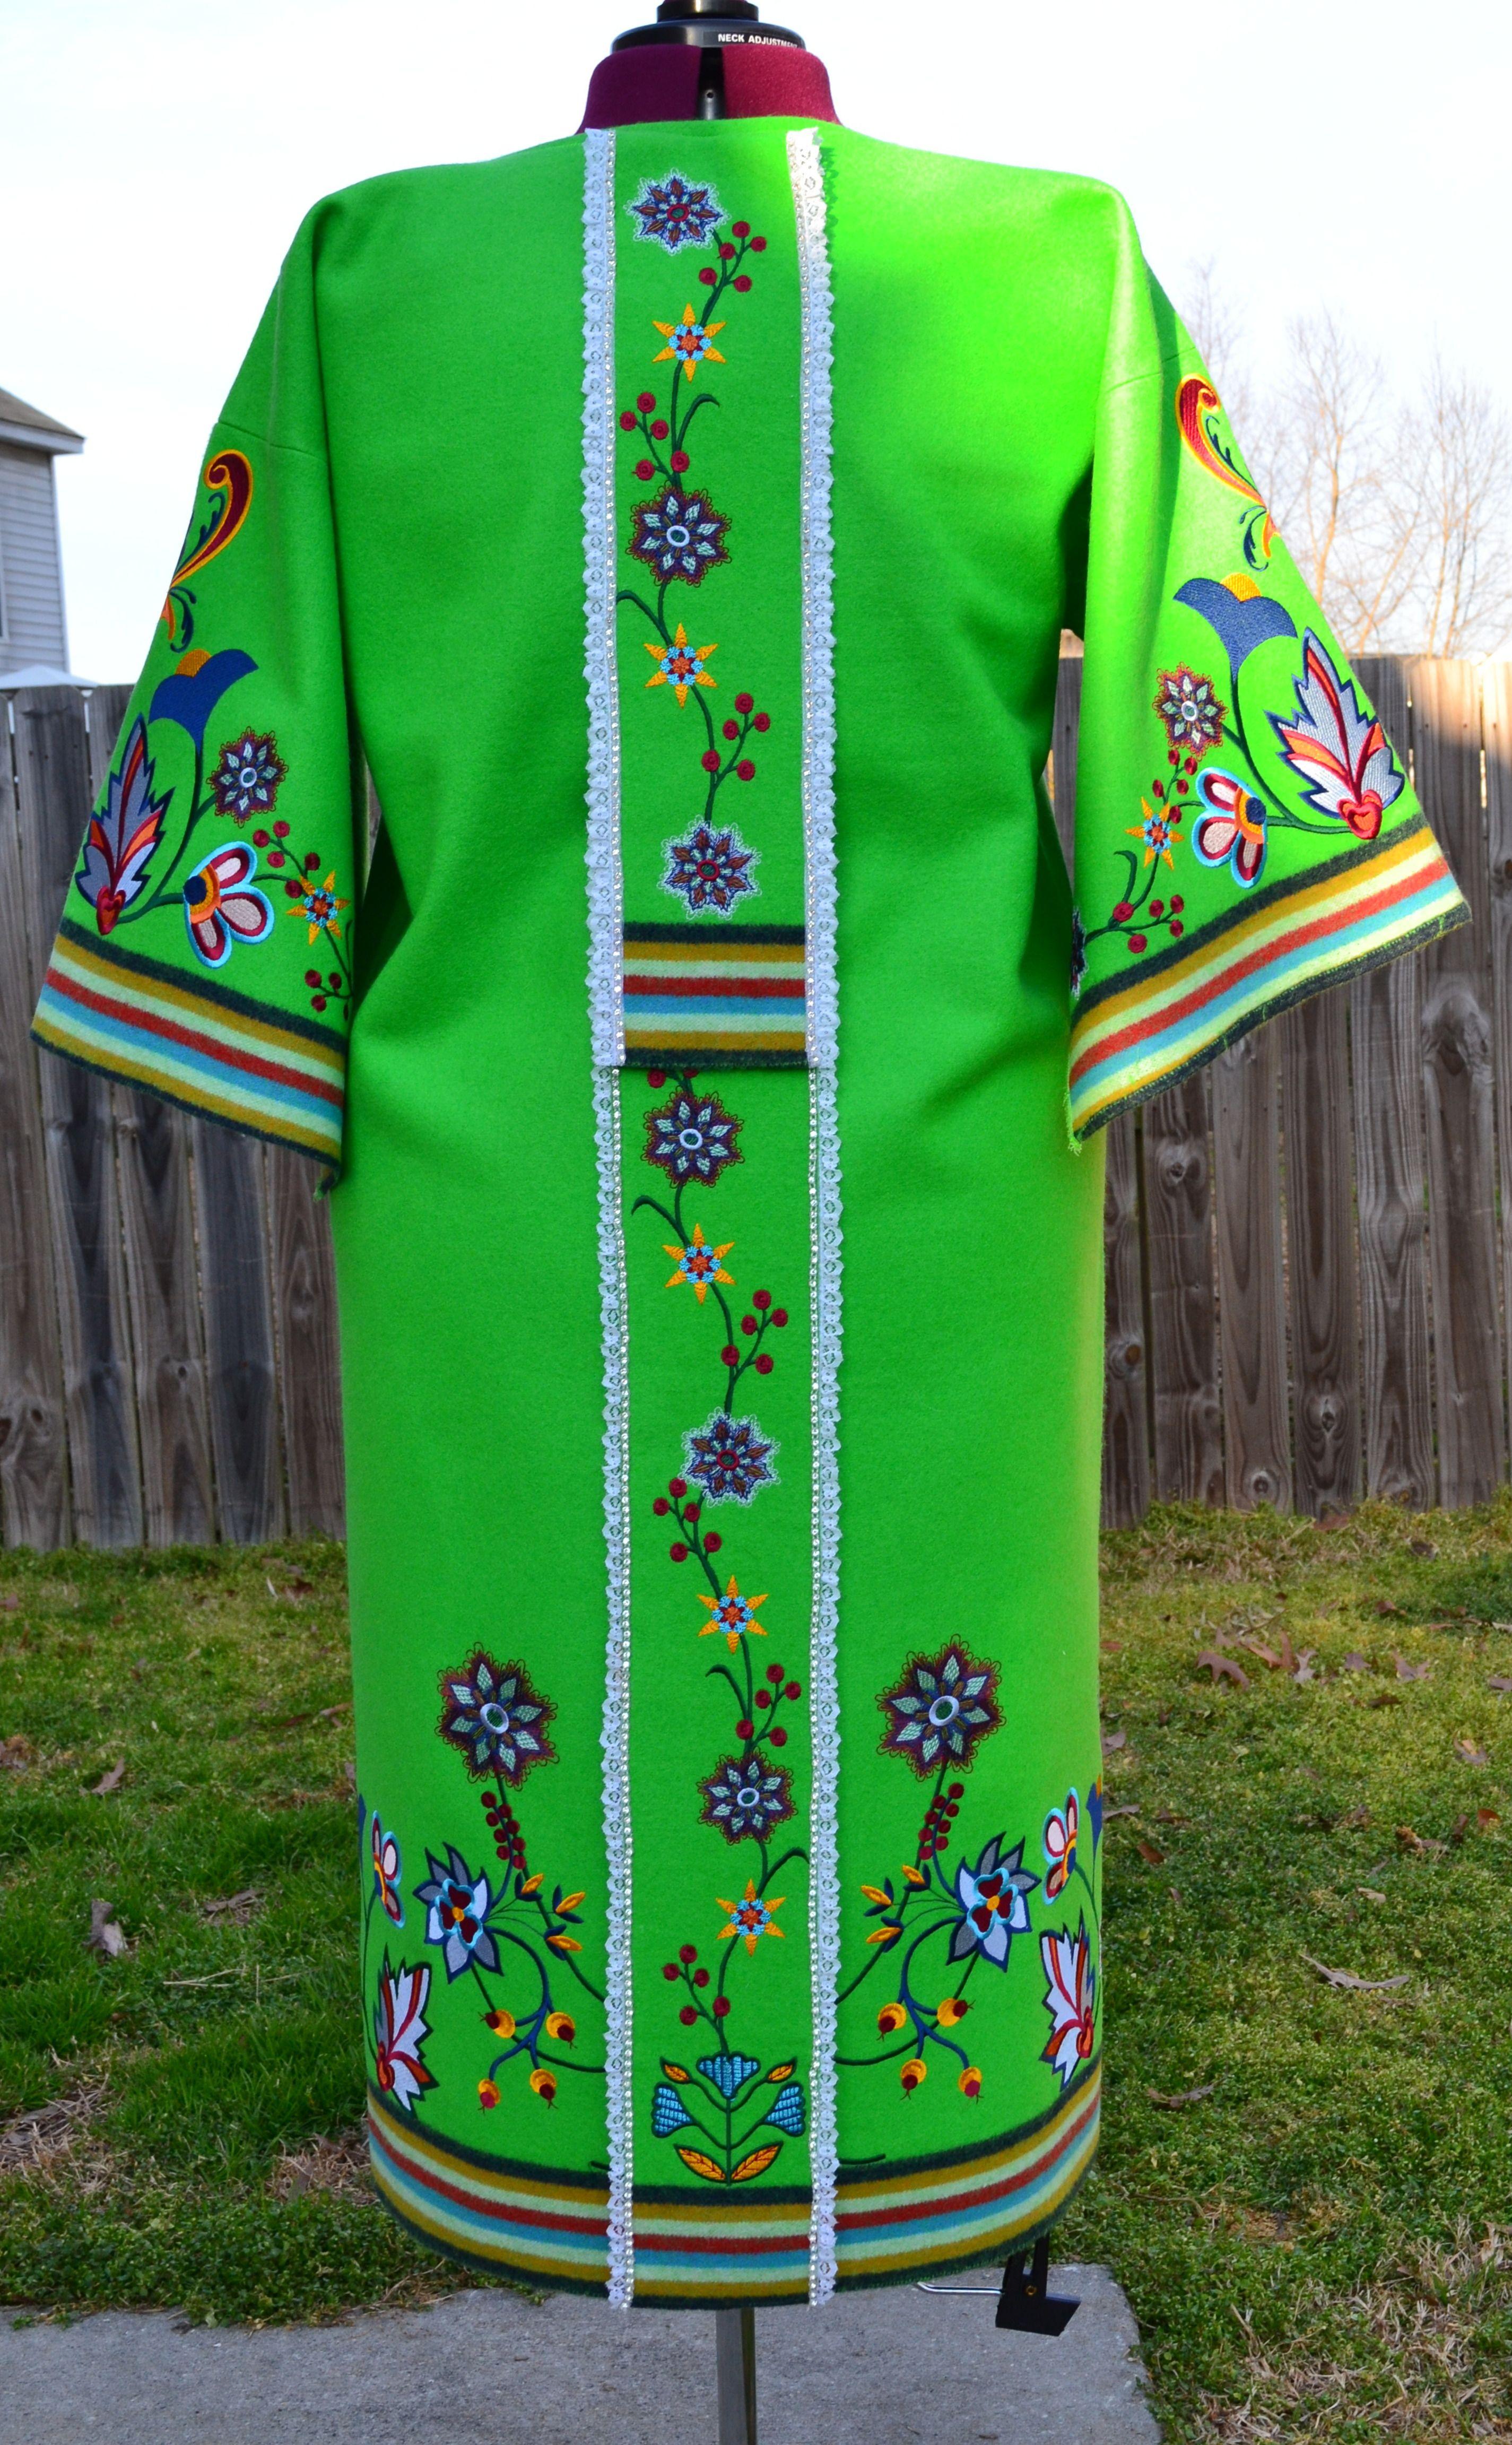 Machine Embroidered Southern Cloth Powwow Regalia: Dress, Shawl, Purse & Trailer